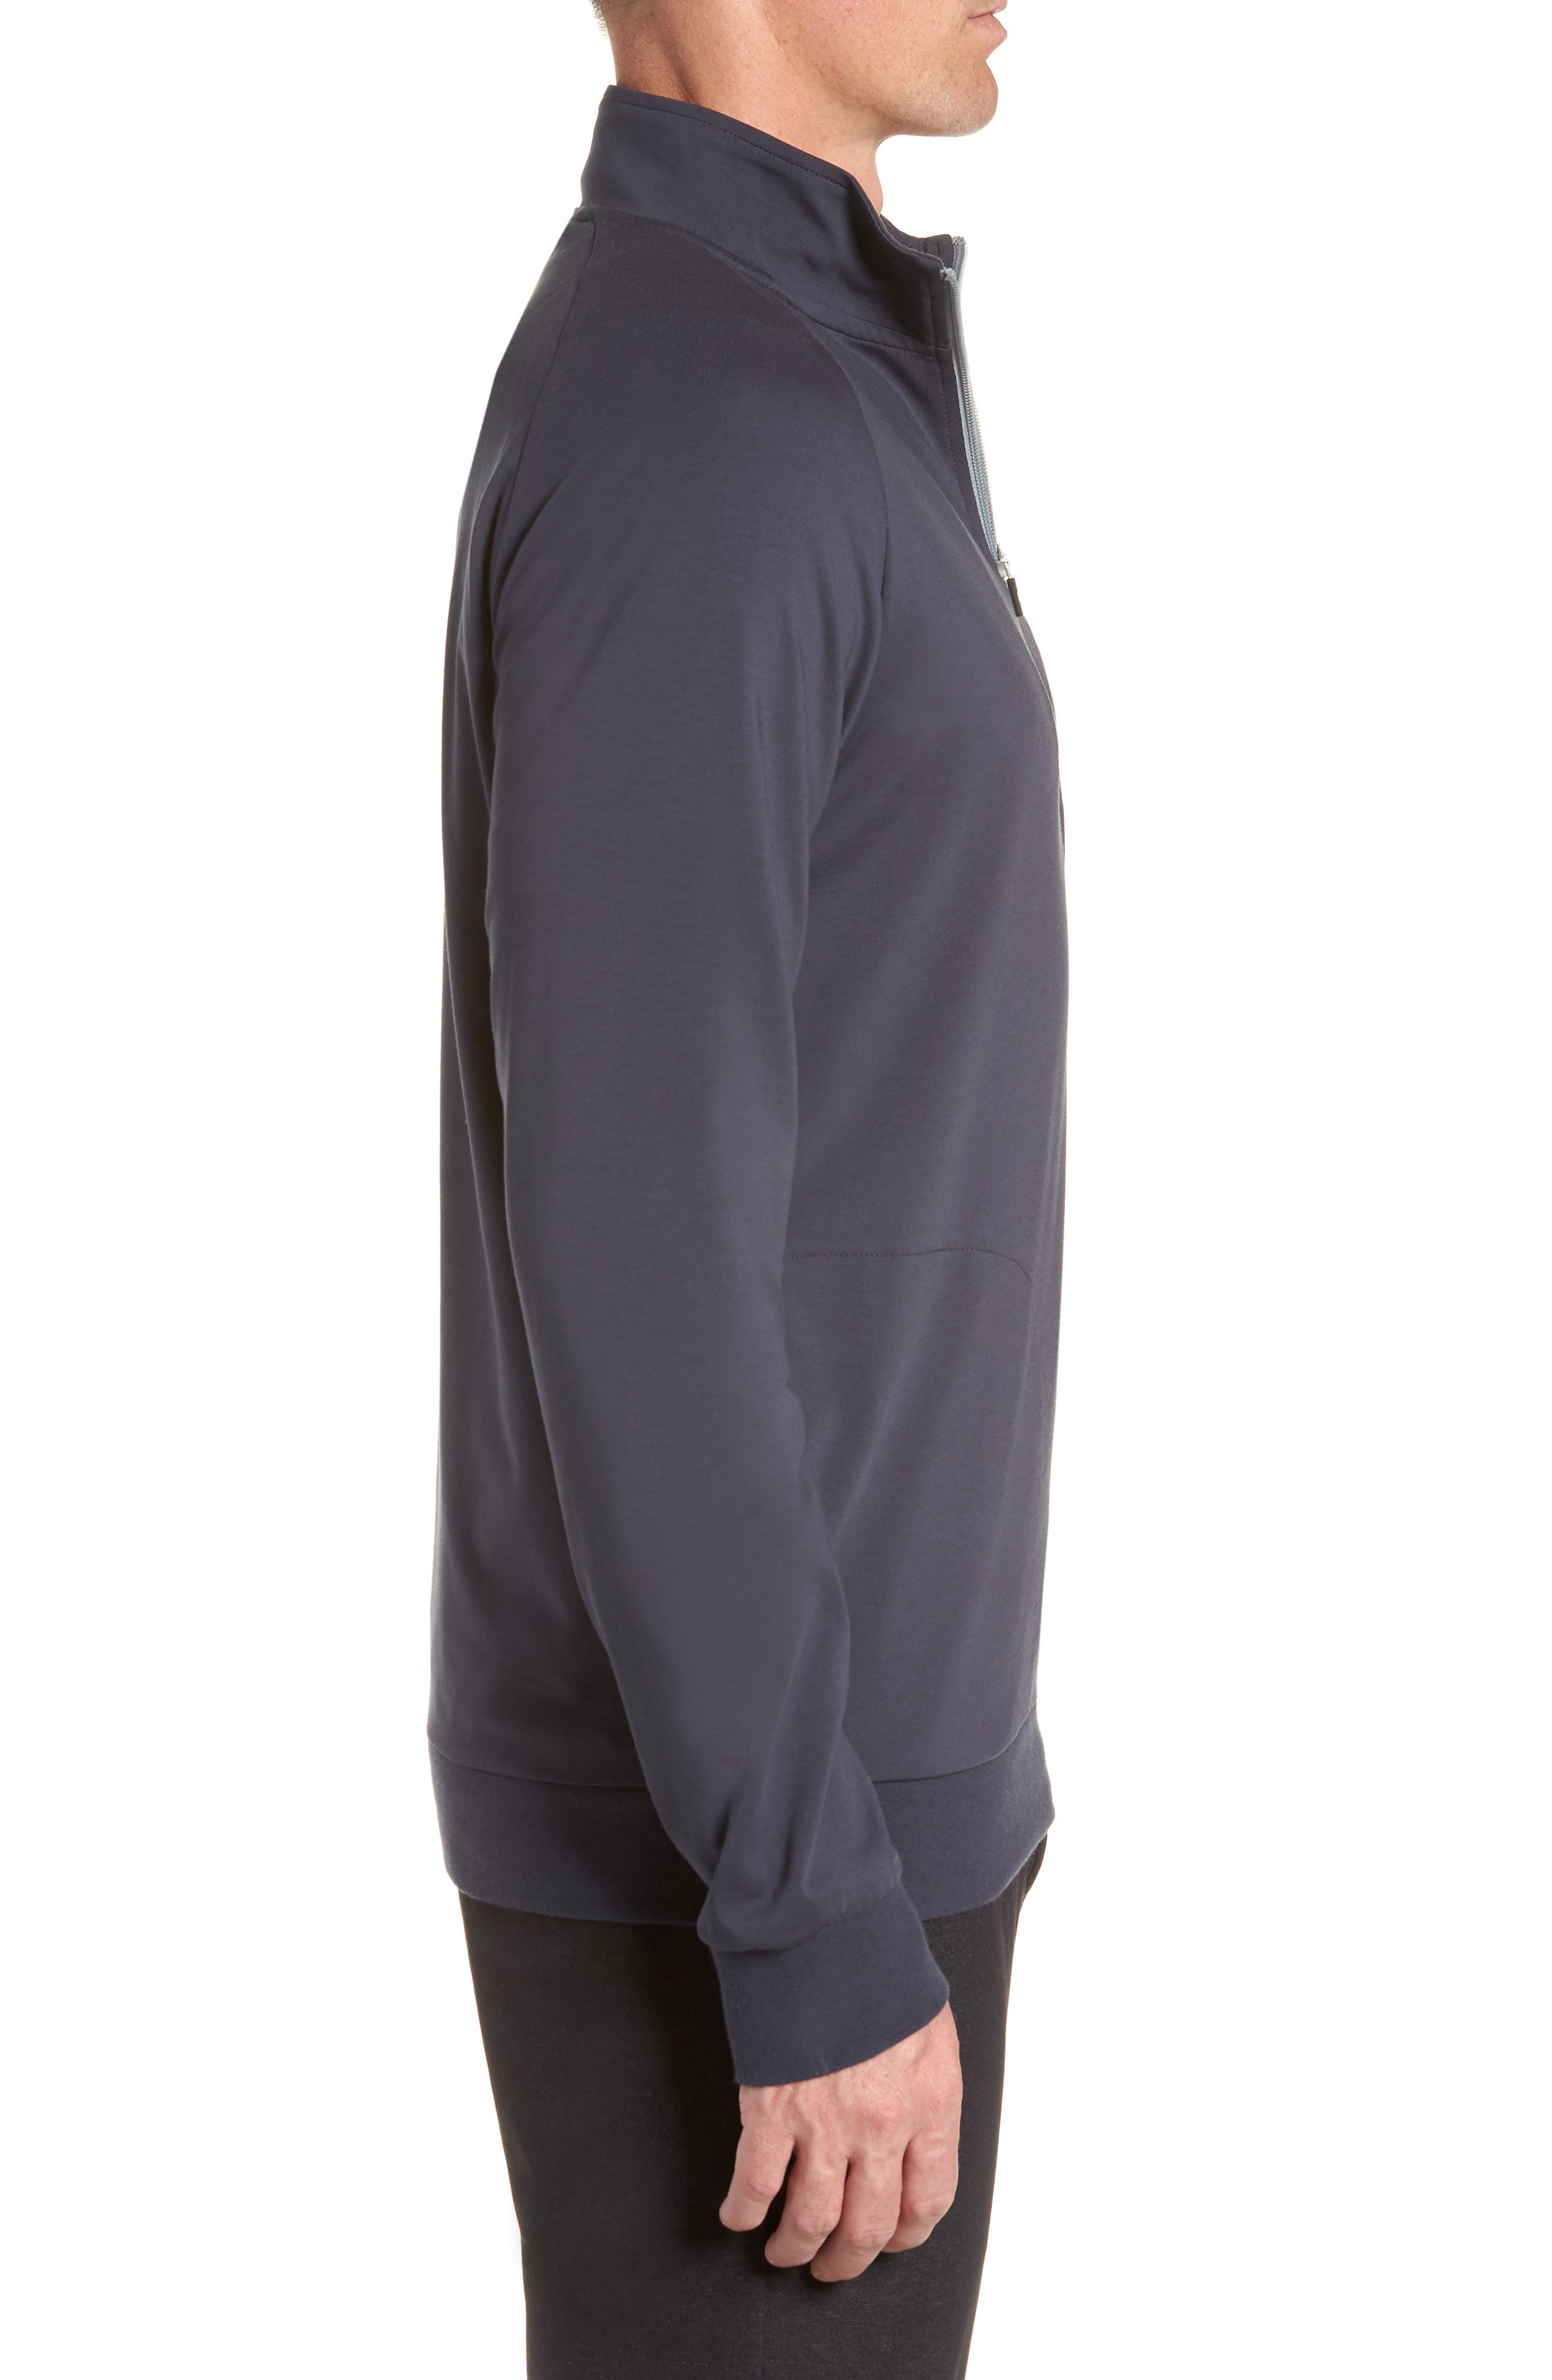 TRAVISMATHEW, 'Strange Love' Trim Fit Wrinkle Resistant Quarter Zip Jacket, Alternate thumbnail 3, color, BLUE NIGHTS